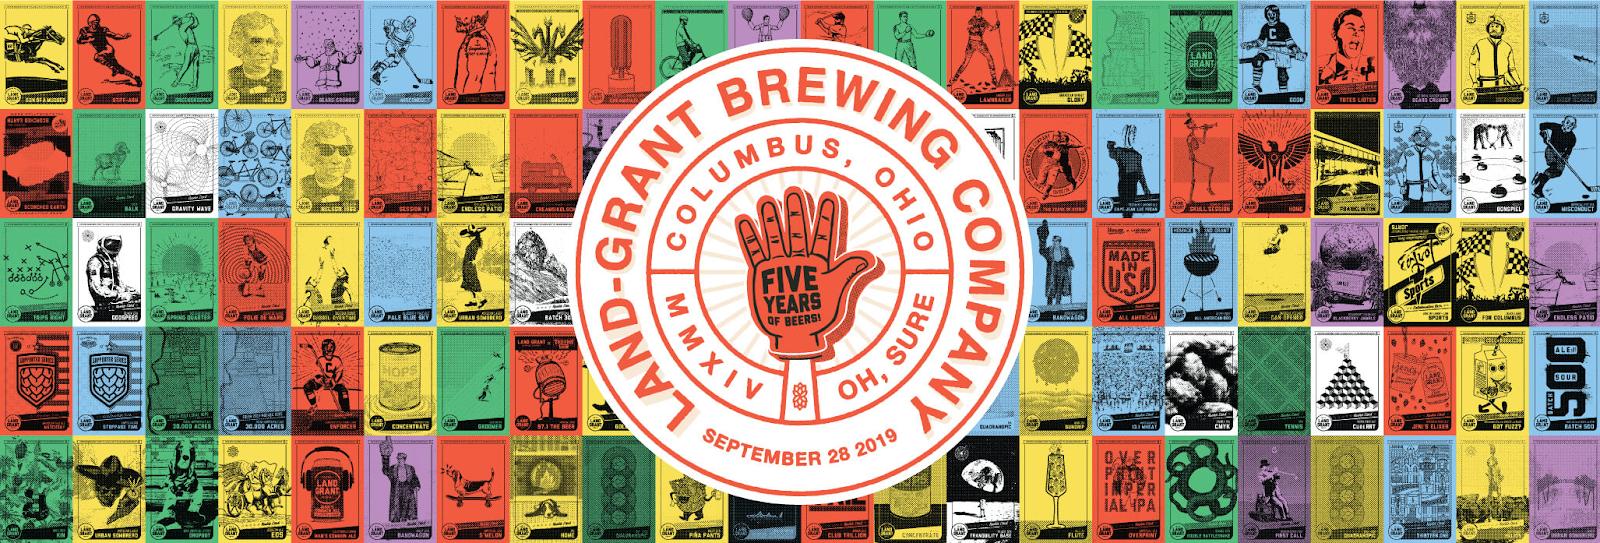 Land-Grant Brewing Company five-year anniversary logo